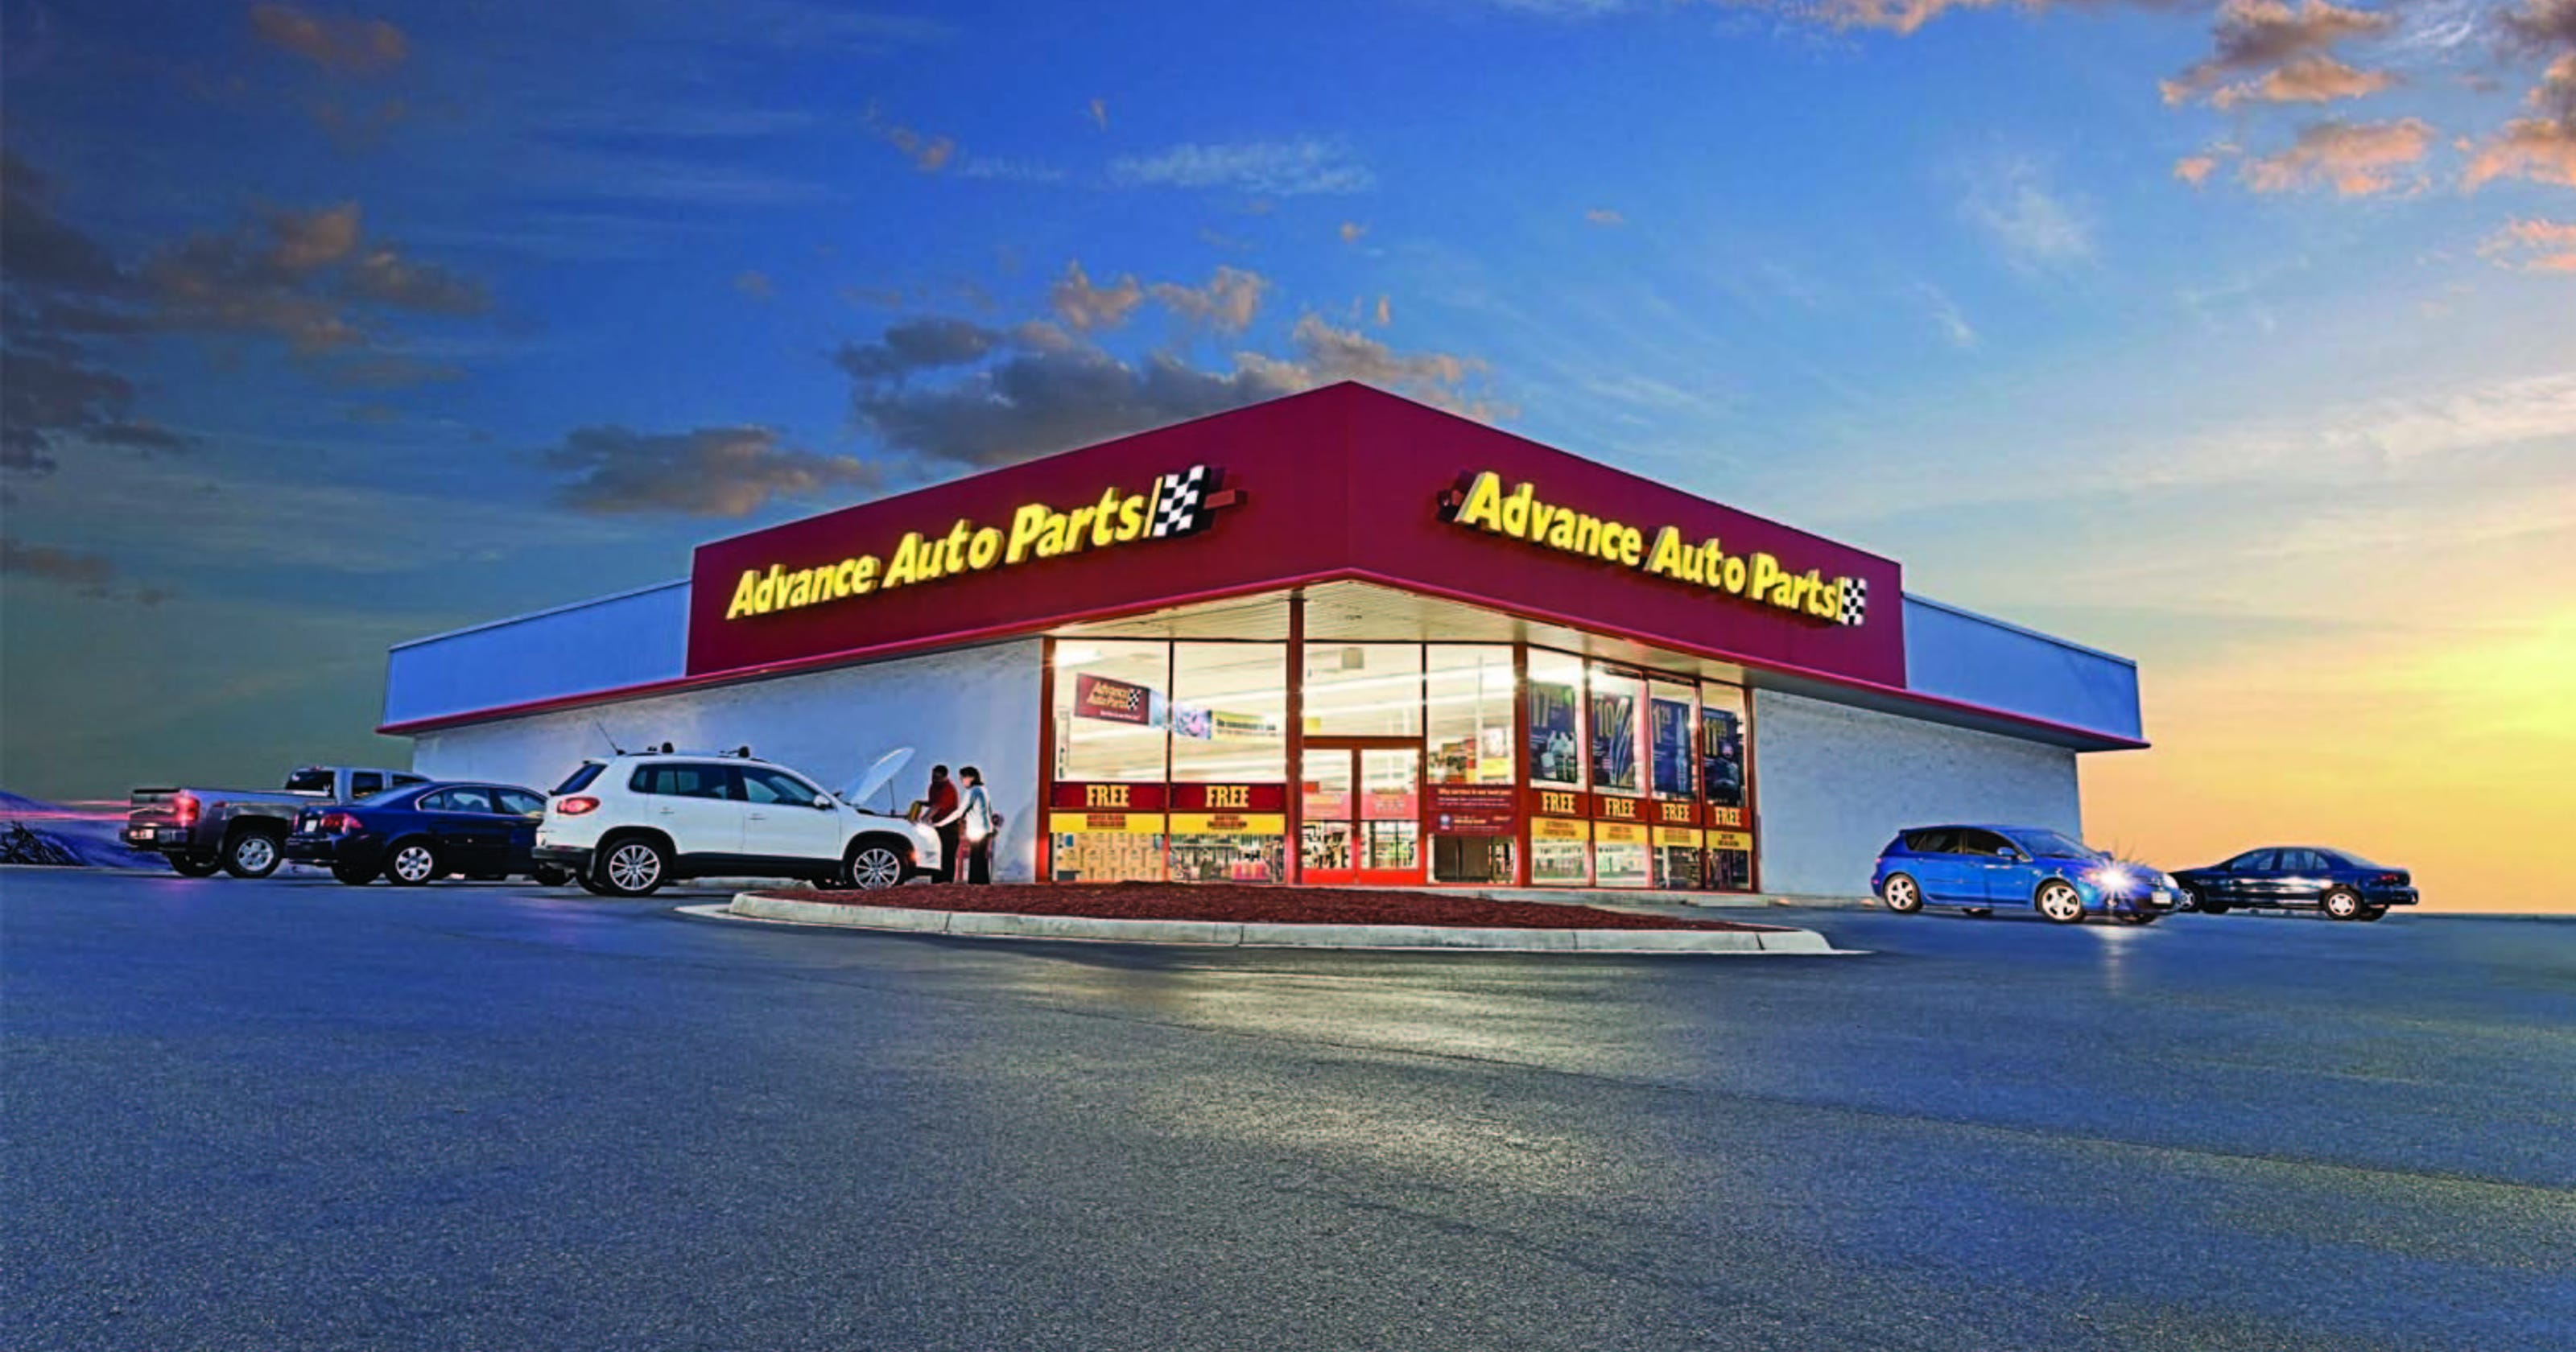 Advance Auto Parts Number >> Ims Secures Partnership With Advance Auto Parts